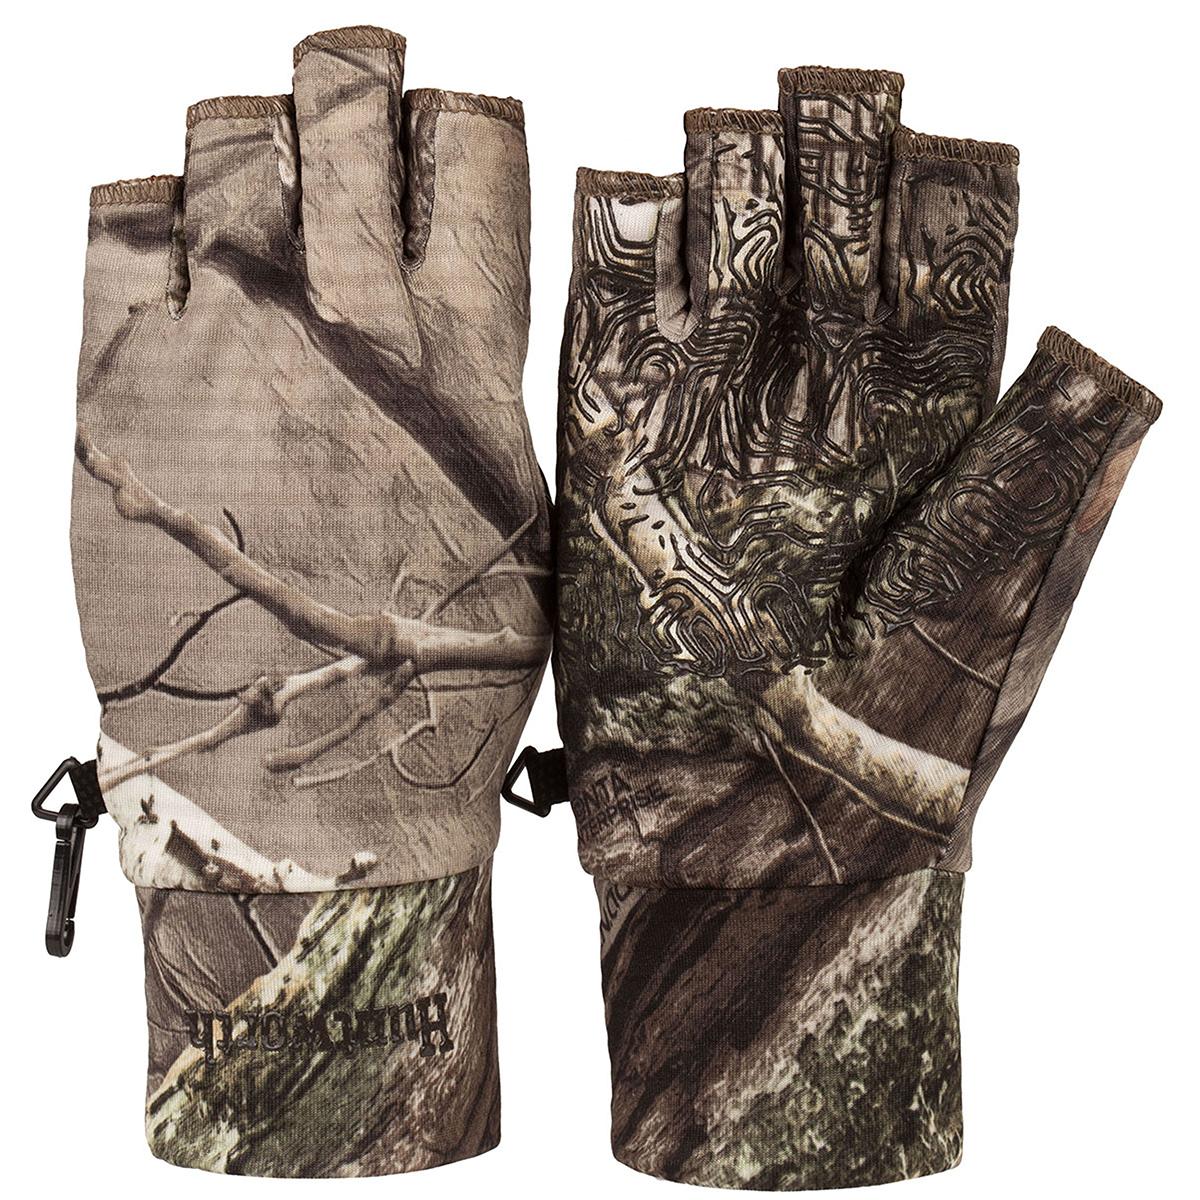 Huntworth Men's Half-Finger Liner Glove, Hidd'n Camo